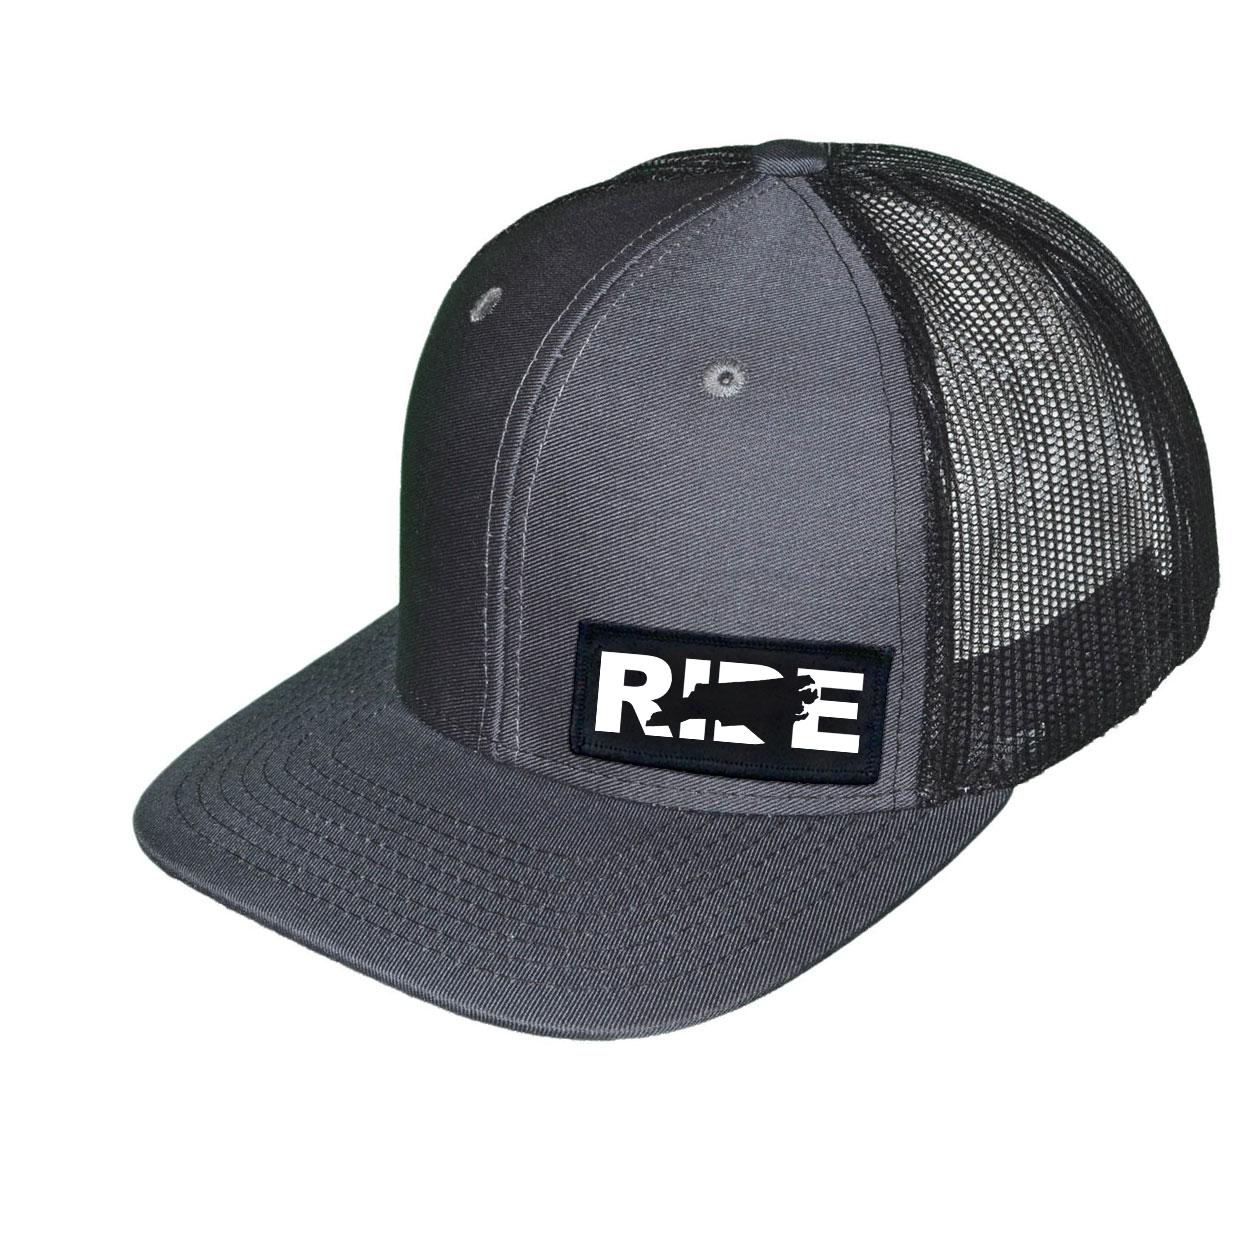 Ride North Carolina Night Out Woven Patch Snapback Trucker Hat Dark Gray/Black (White Logo)